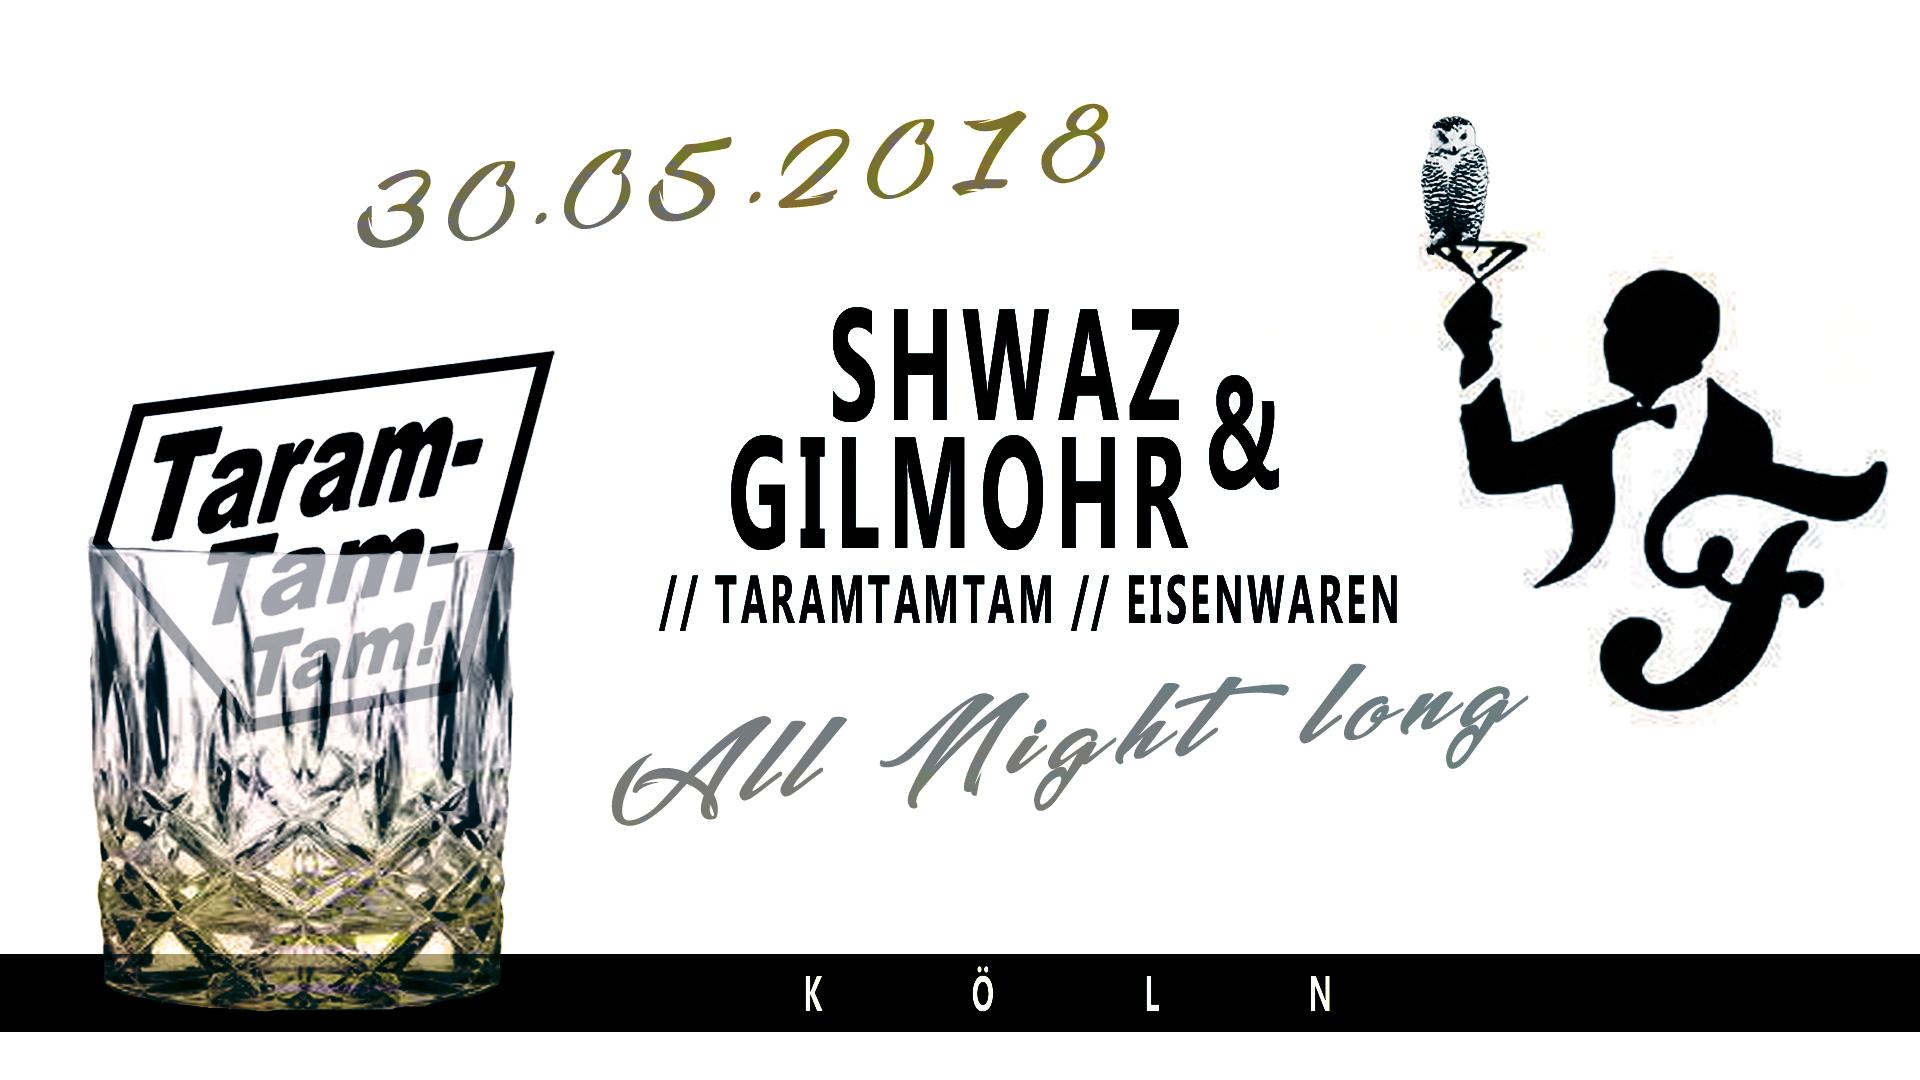 Taramtamtam Eventflyer 30.05.2018 - Friesen Bar - Köln